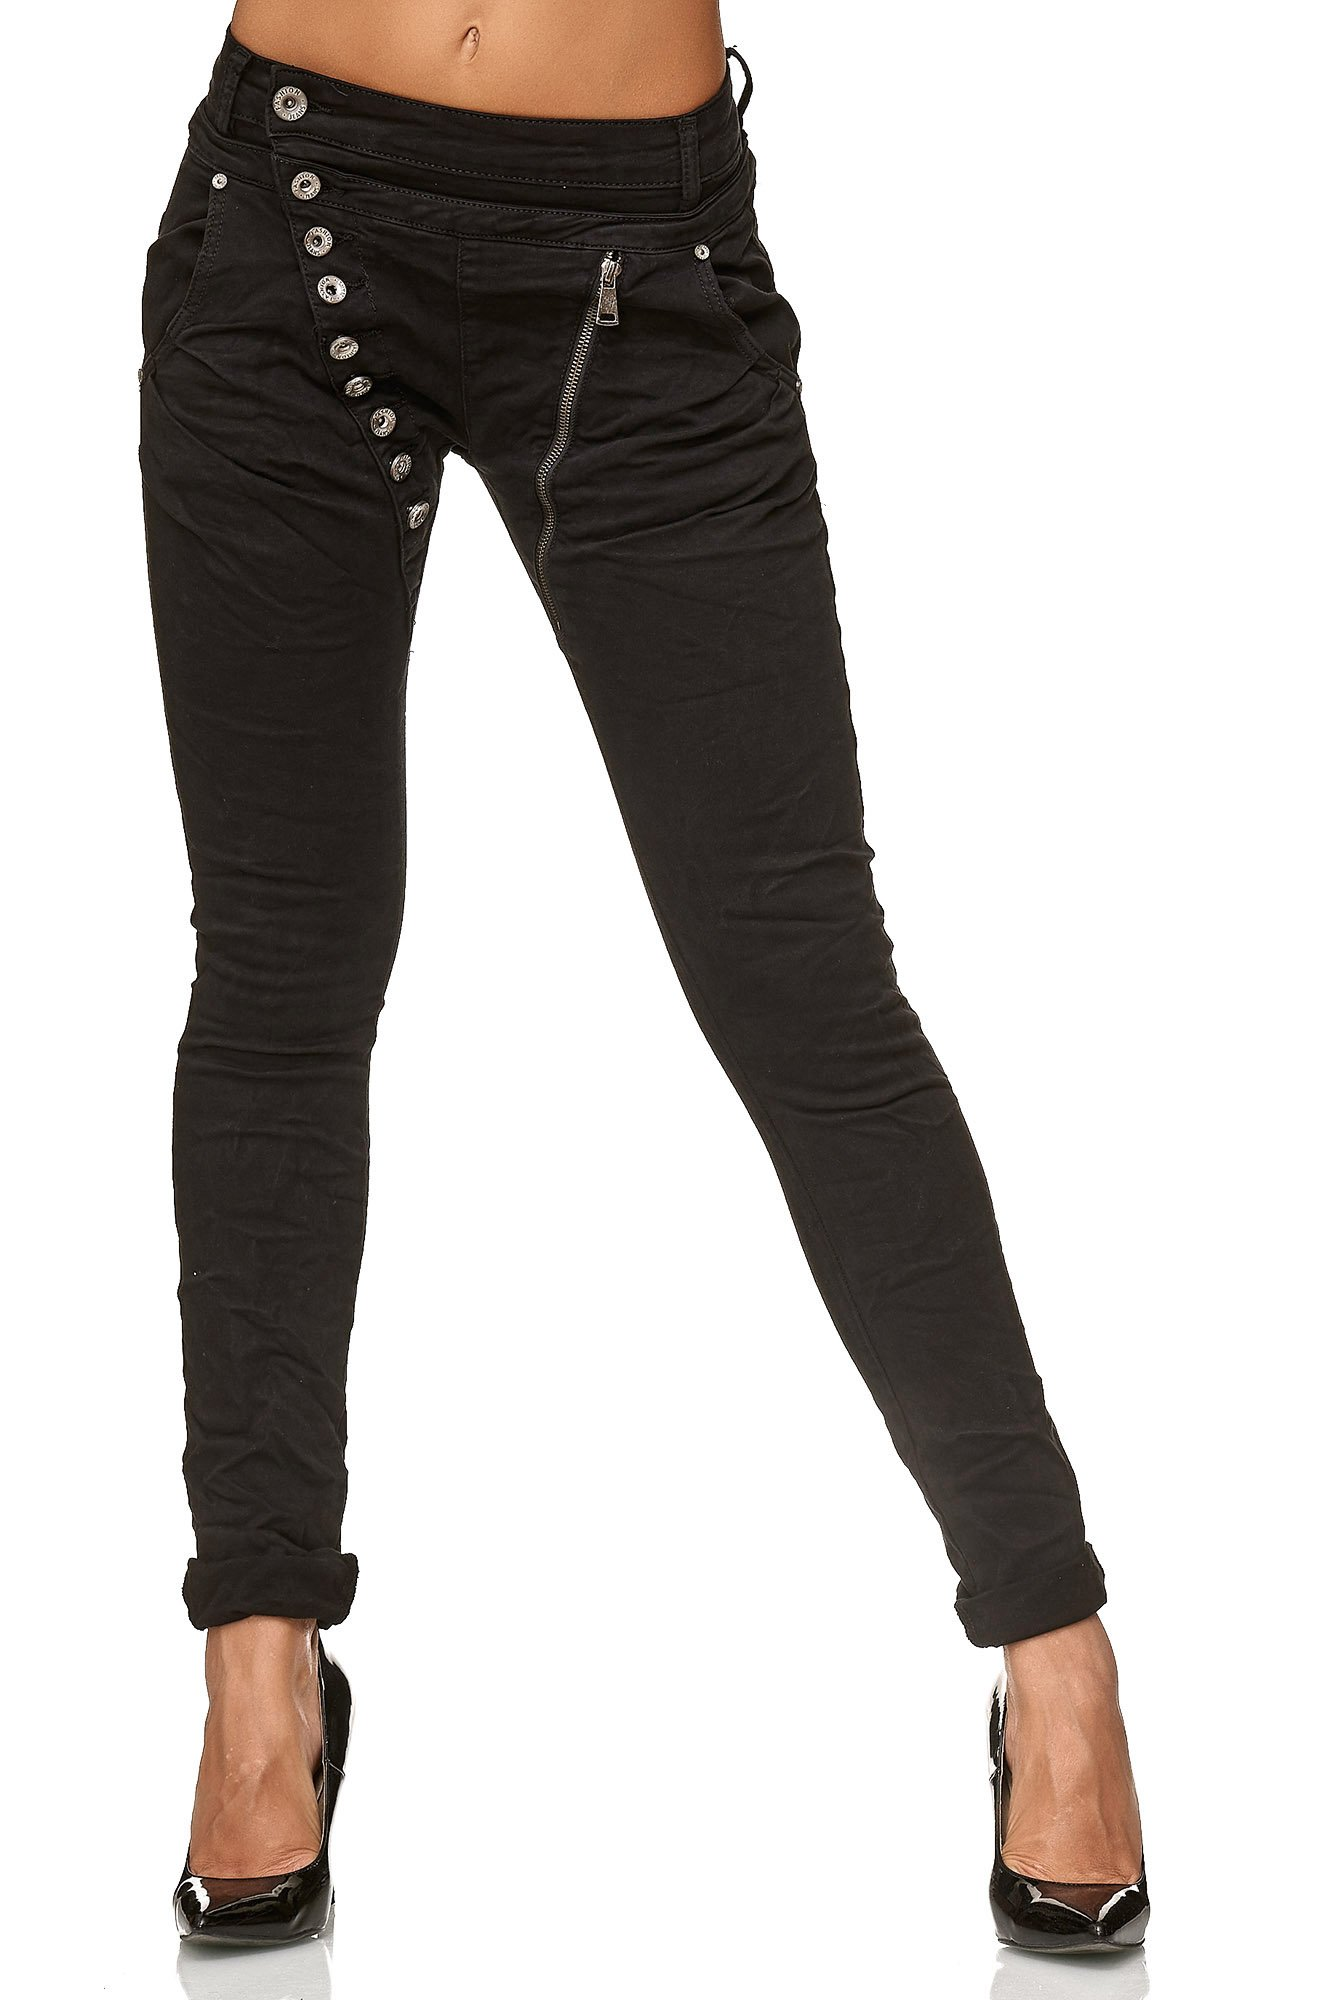 Jeans Femmes Pantalon Baggy Boutons Chunkyrayan